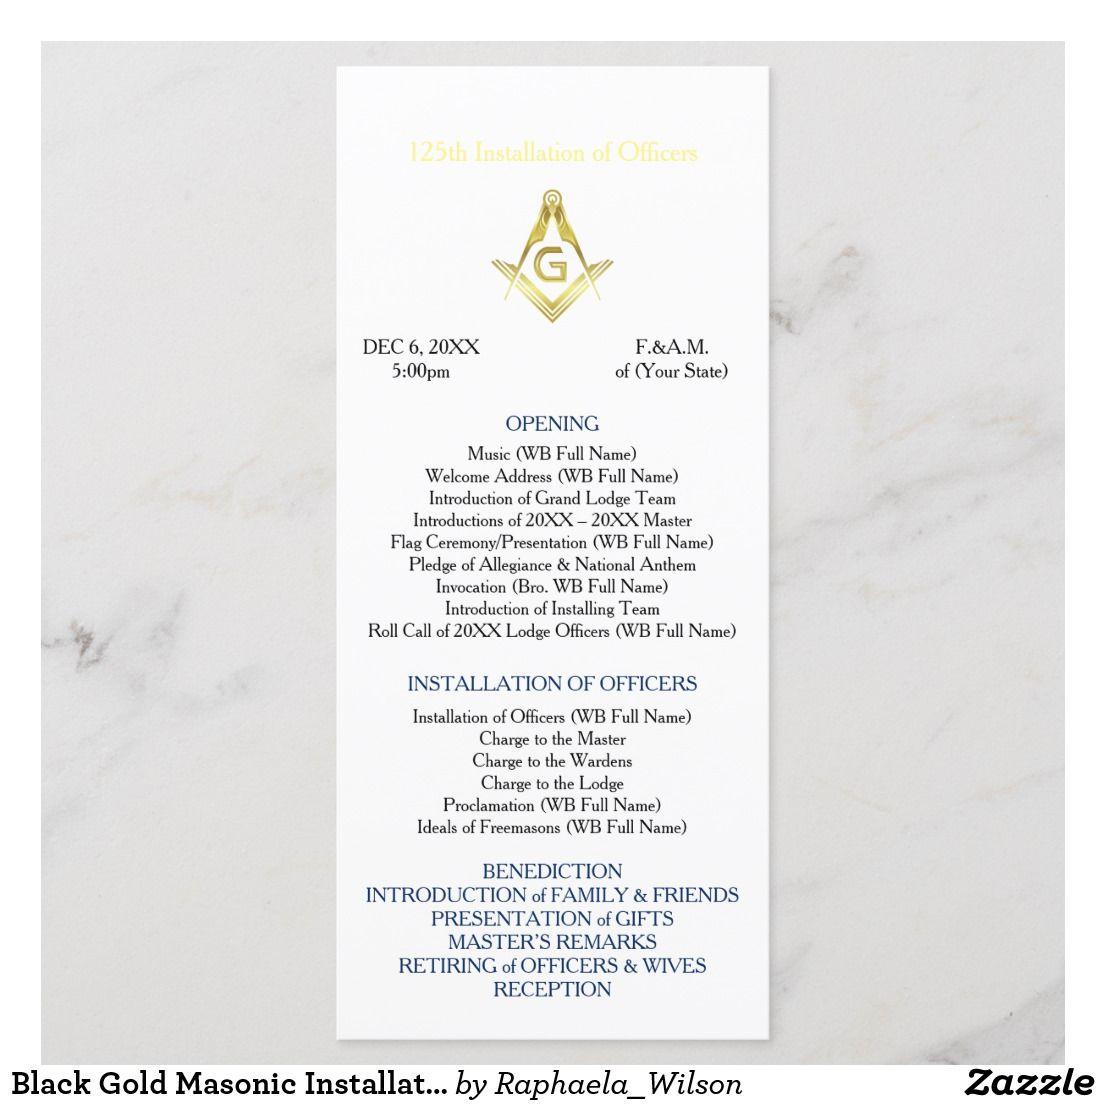 Black Gold Masonic Installation Program Template | Zazzle